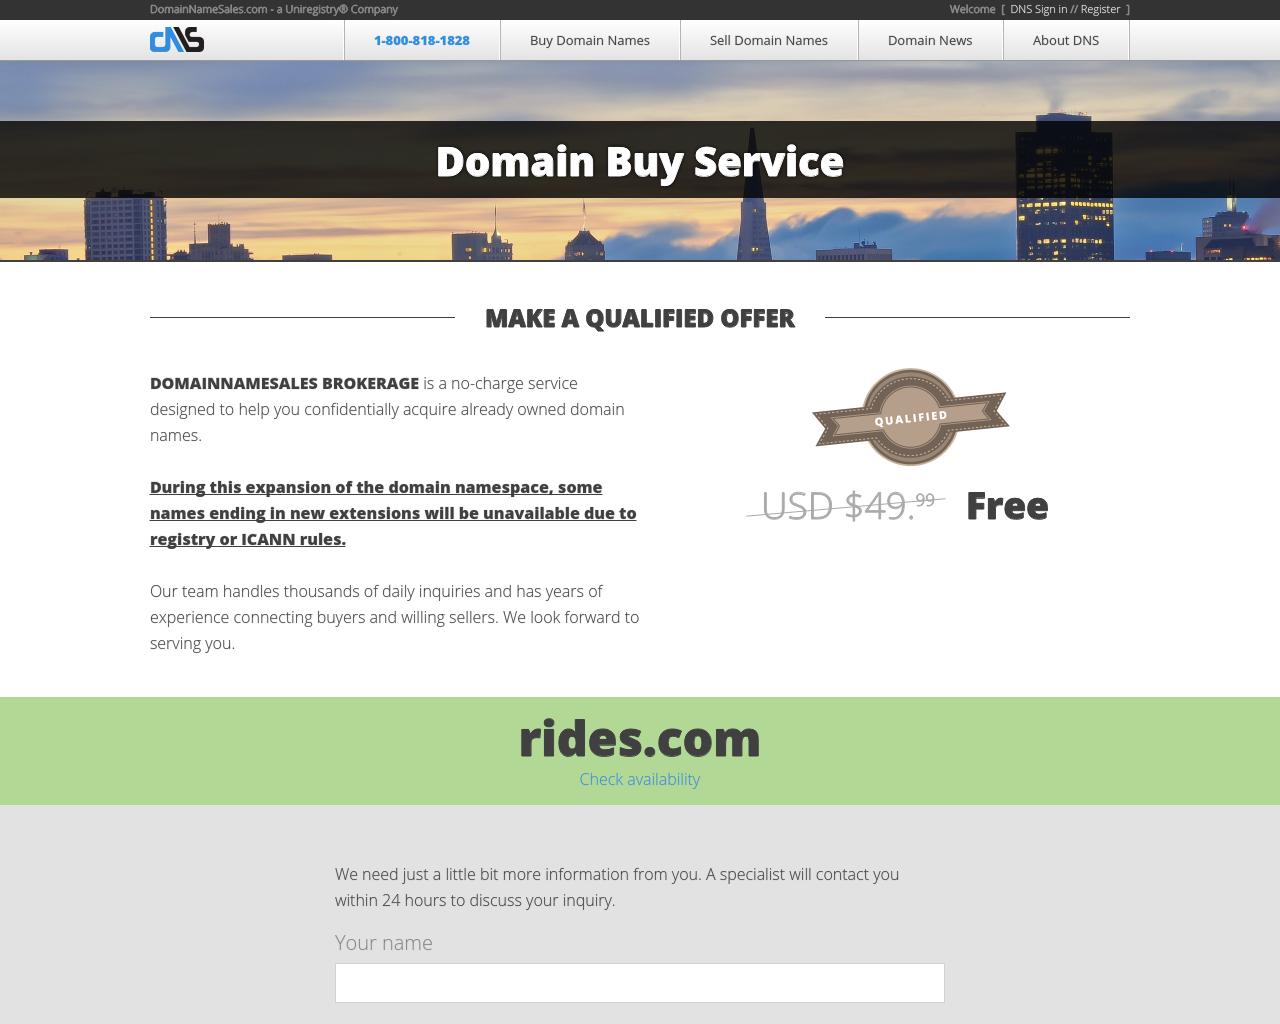 Rides.com-Advertising-Reviews-Pricing